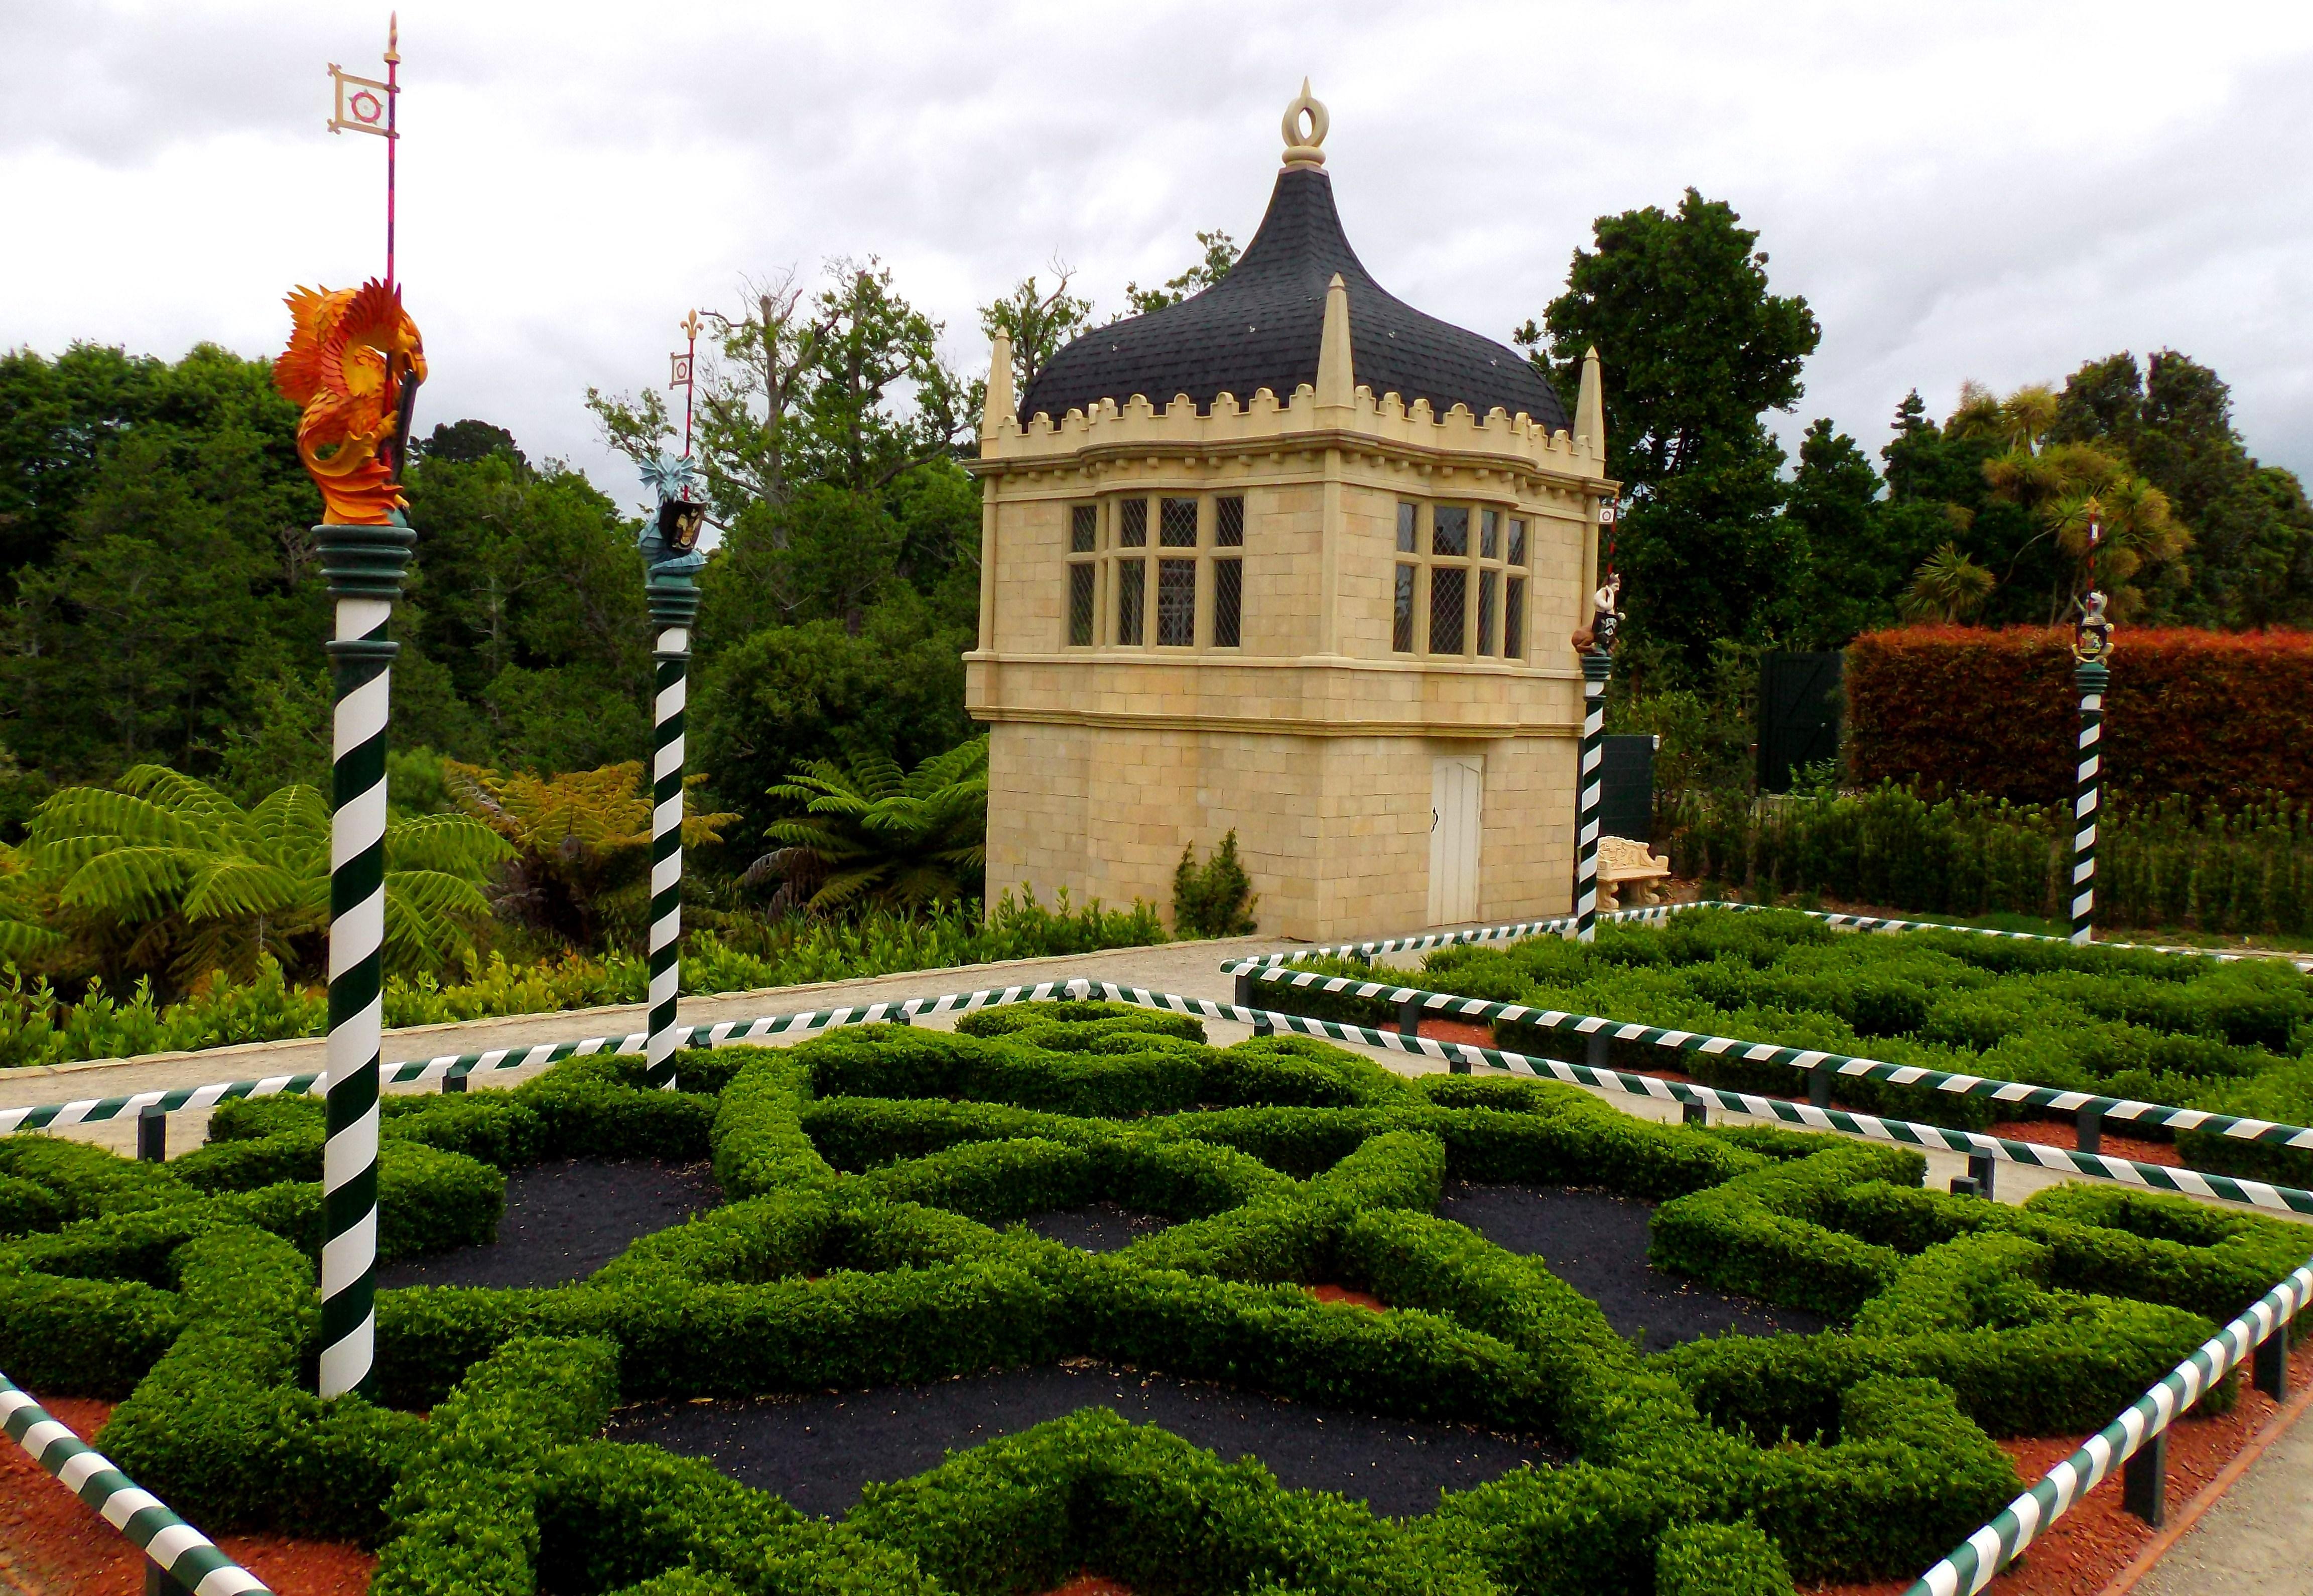 Getting Lost In Fantasy Gardens